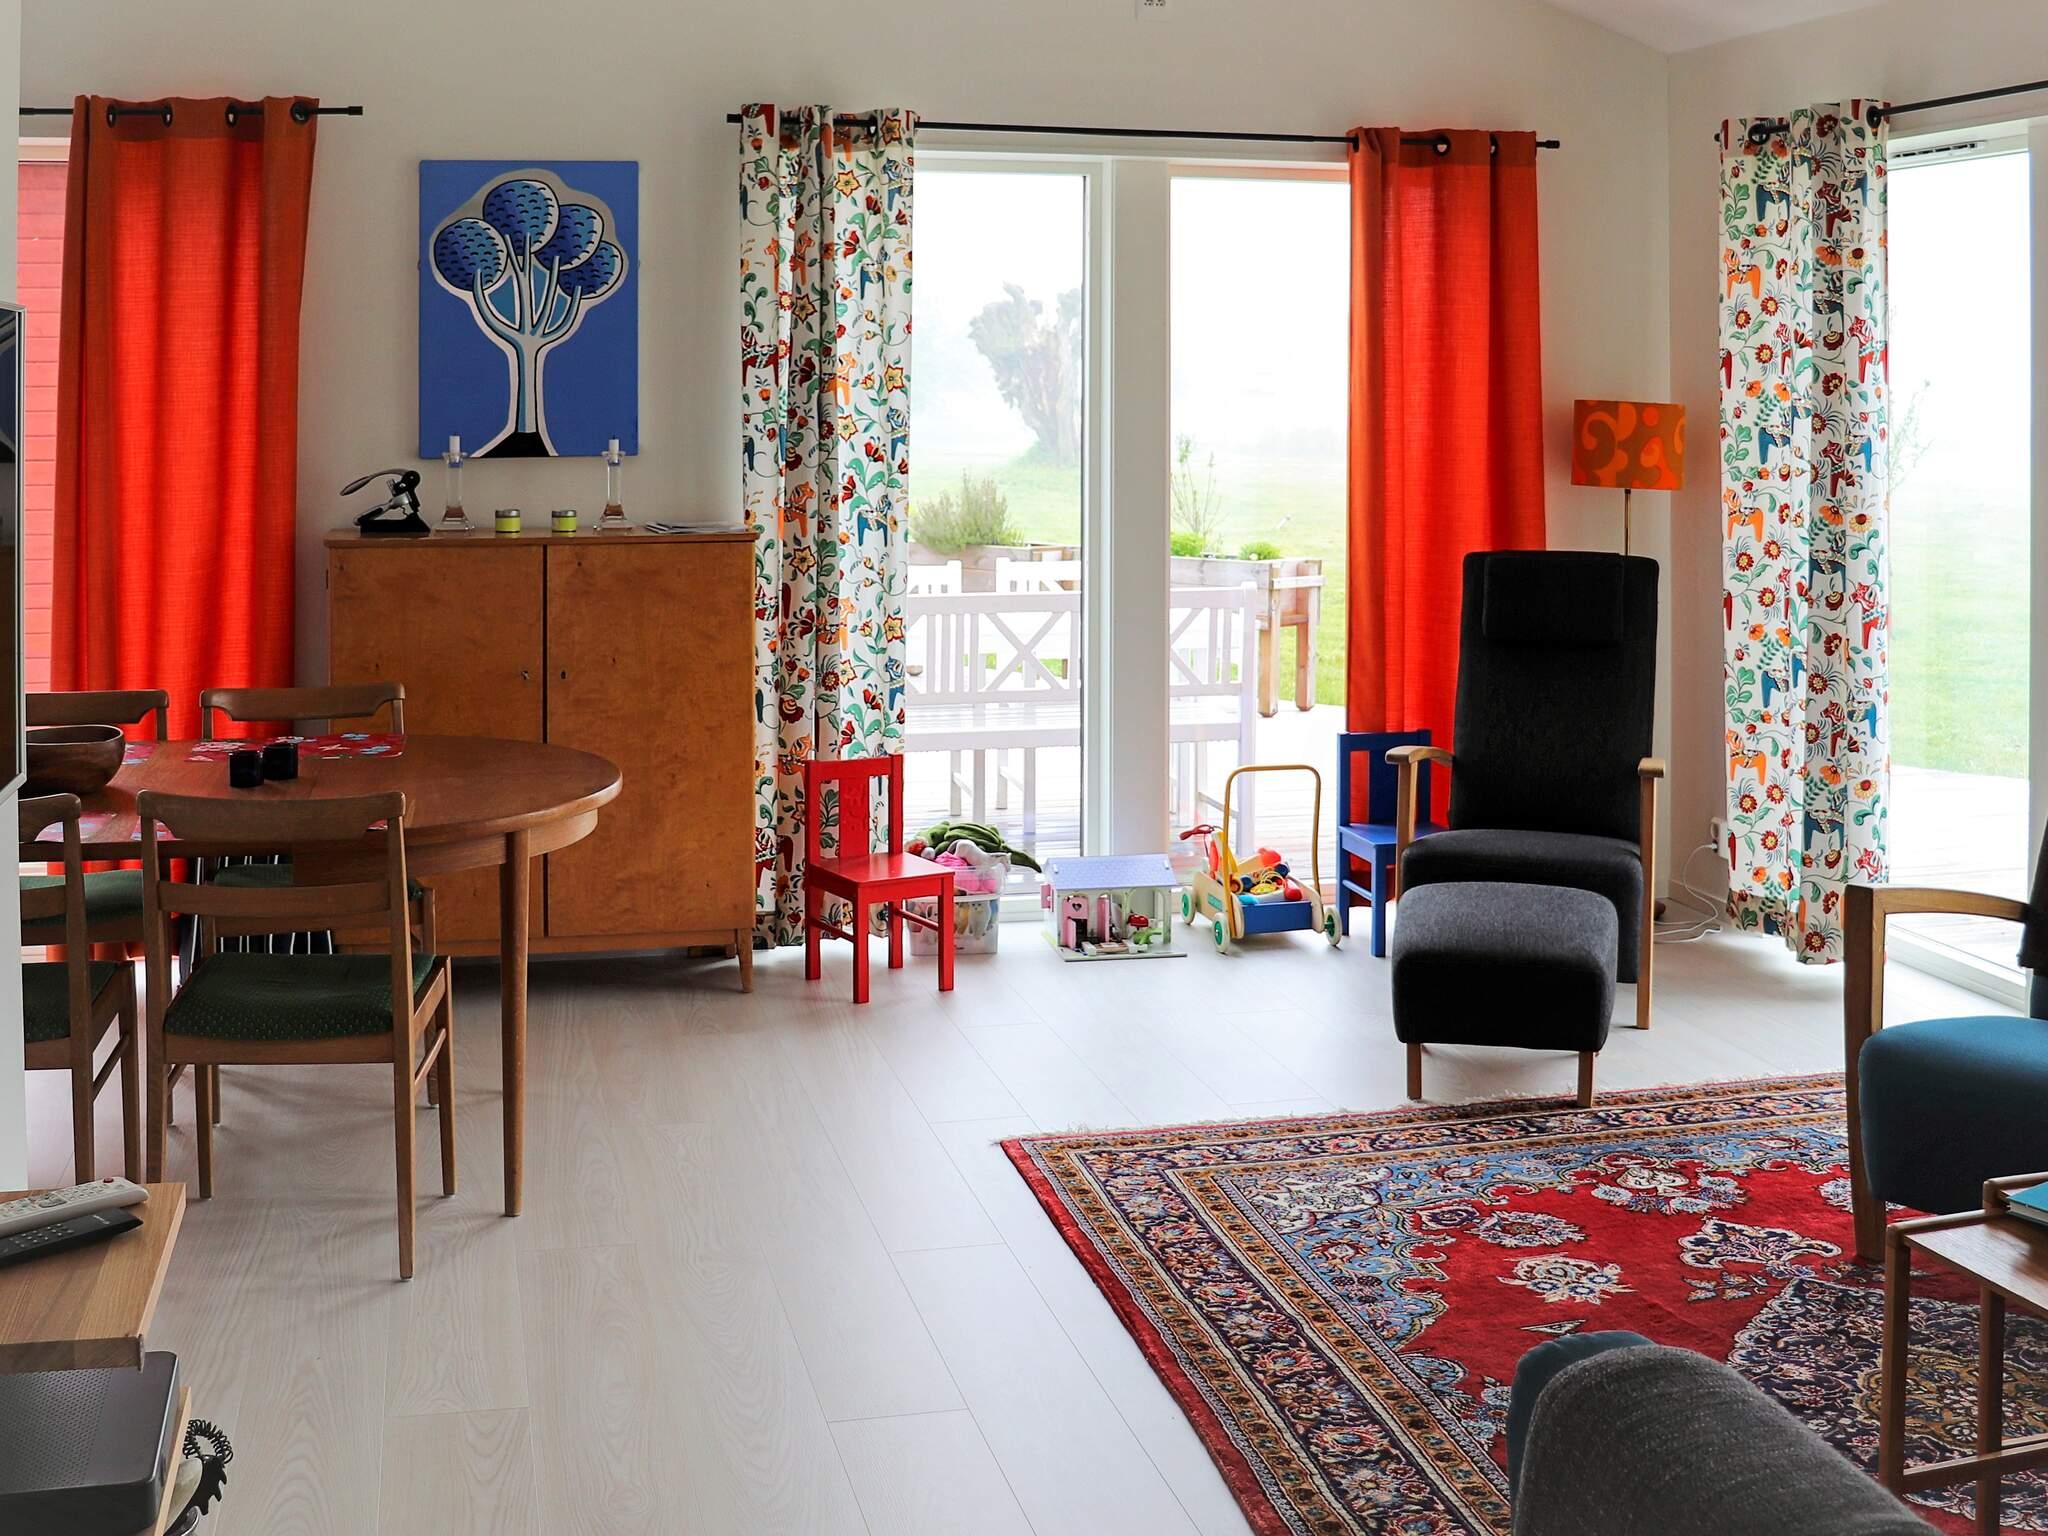 Ferienhaus Degeberga (2624324), Degeberga, Skane län, Südschweden, Schweden, Bild 5